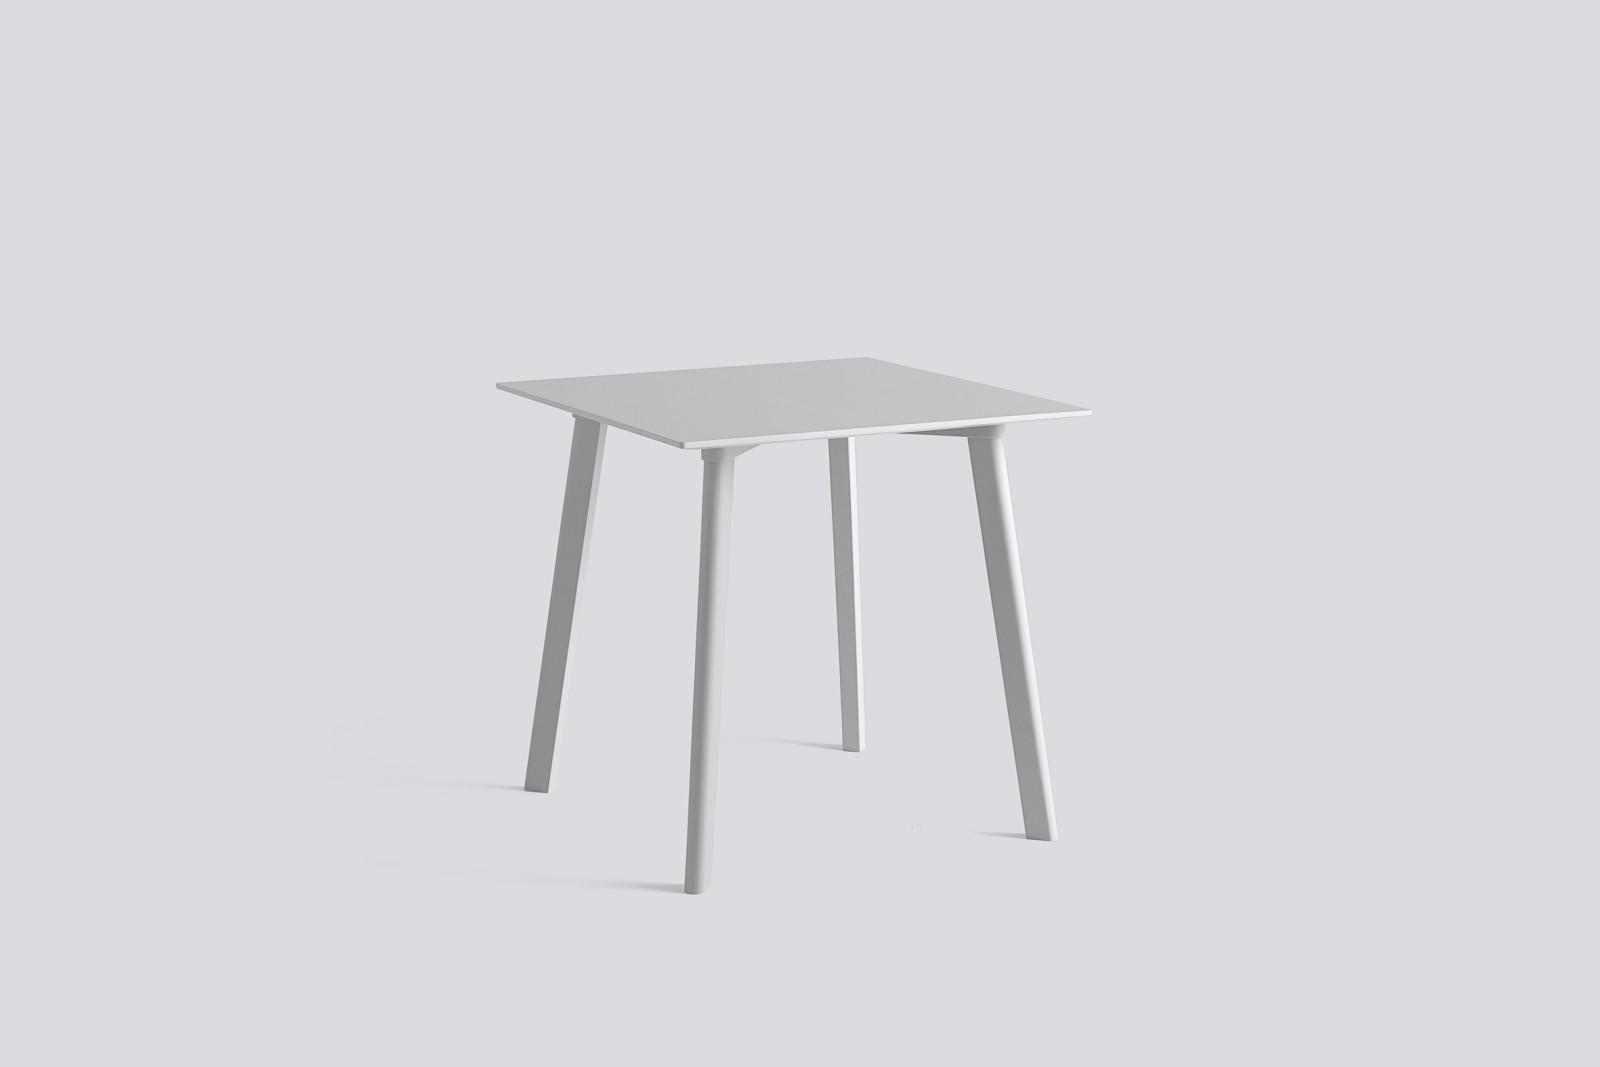 Copenhague Deux (CPH210) Square Dining Table Dusty Grey Laminate Top, Dusty Grey Beech Base